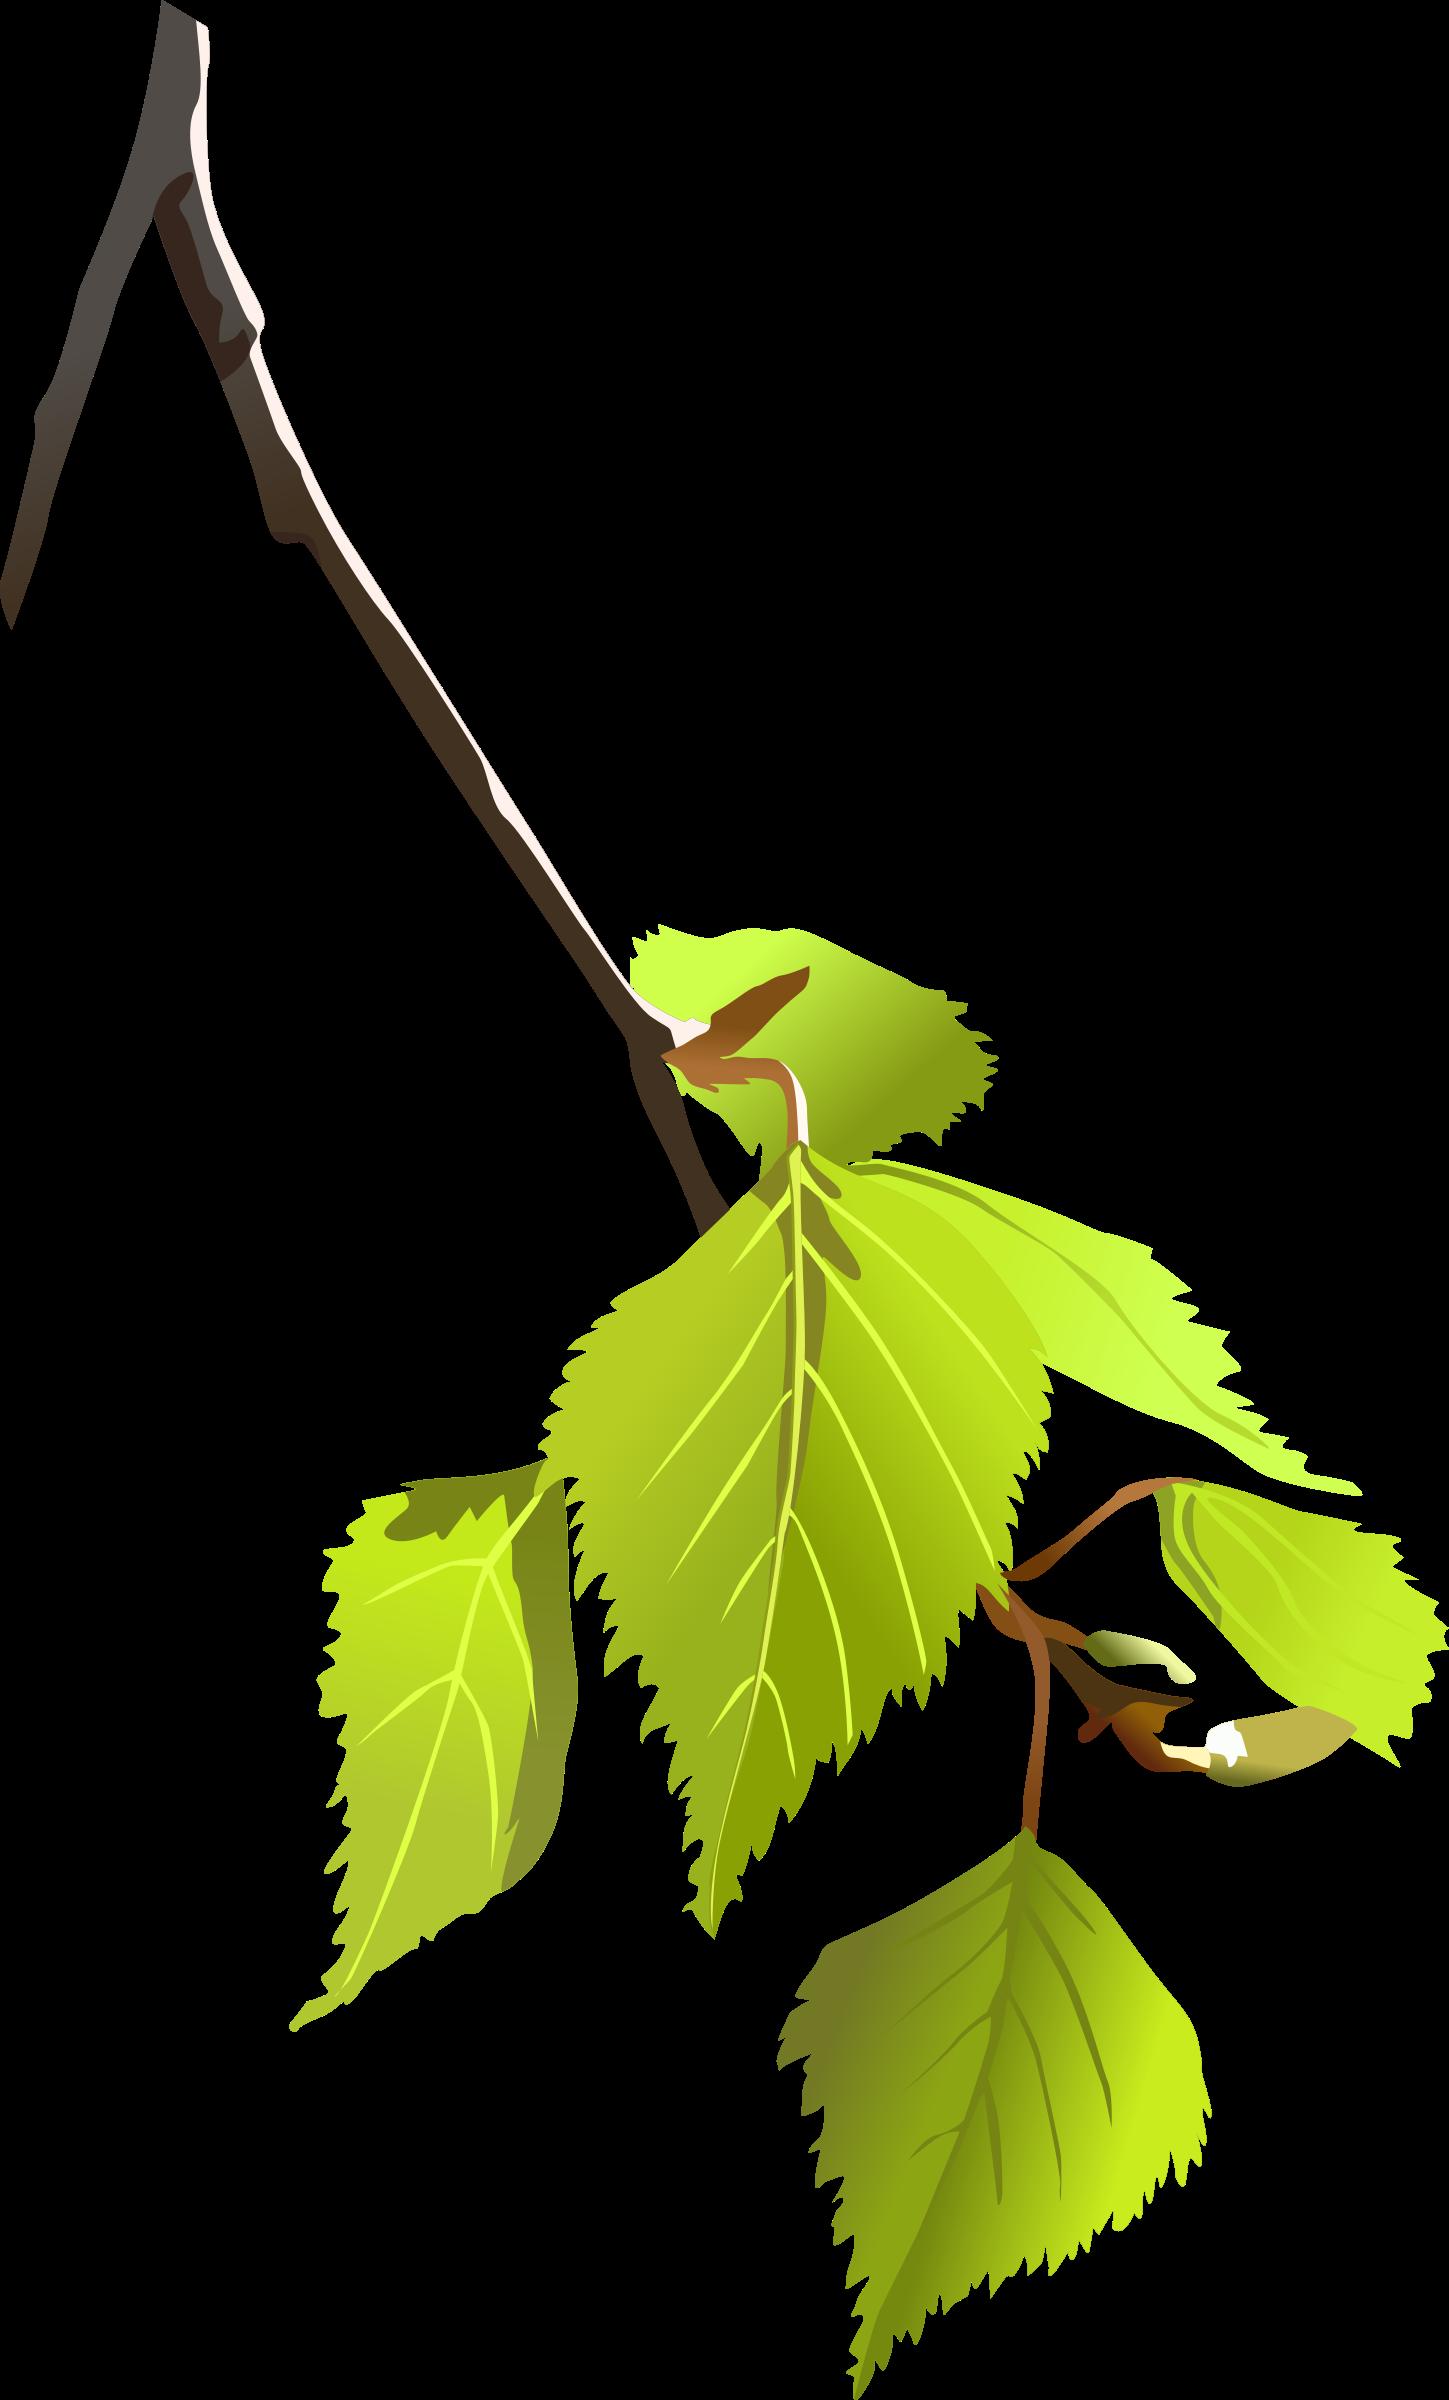 Fall birch tree clipart banner Clipart - Birch leafs banner